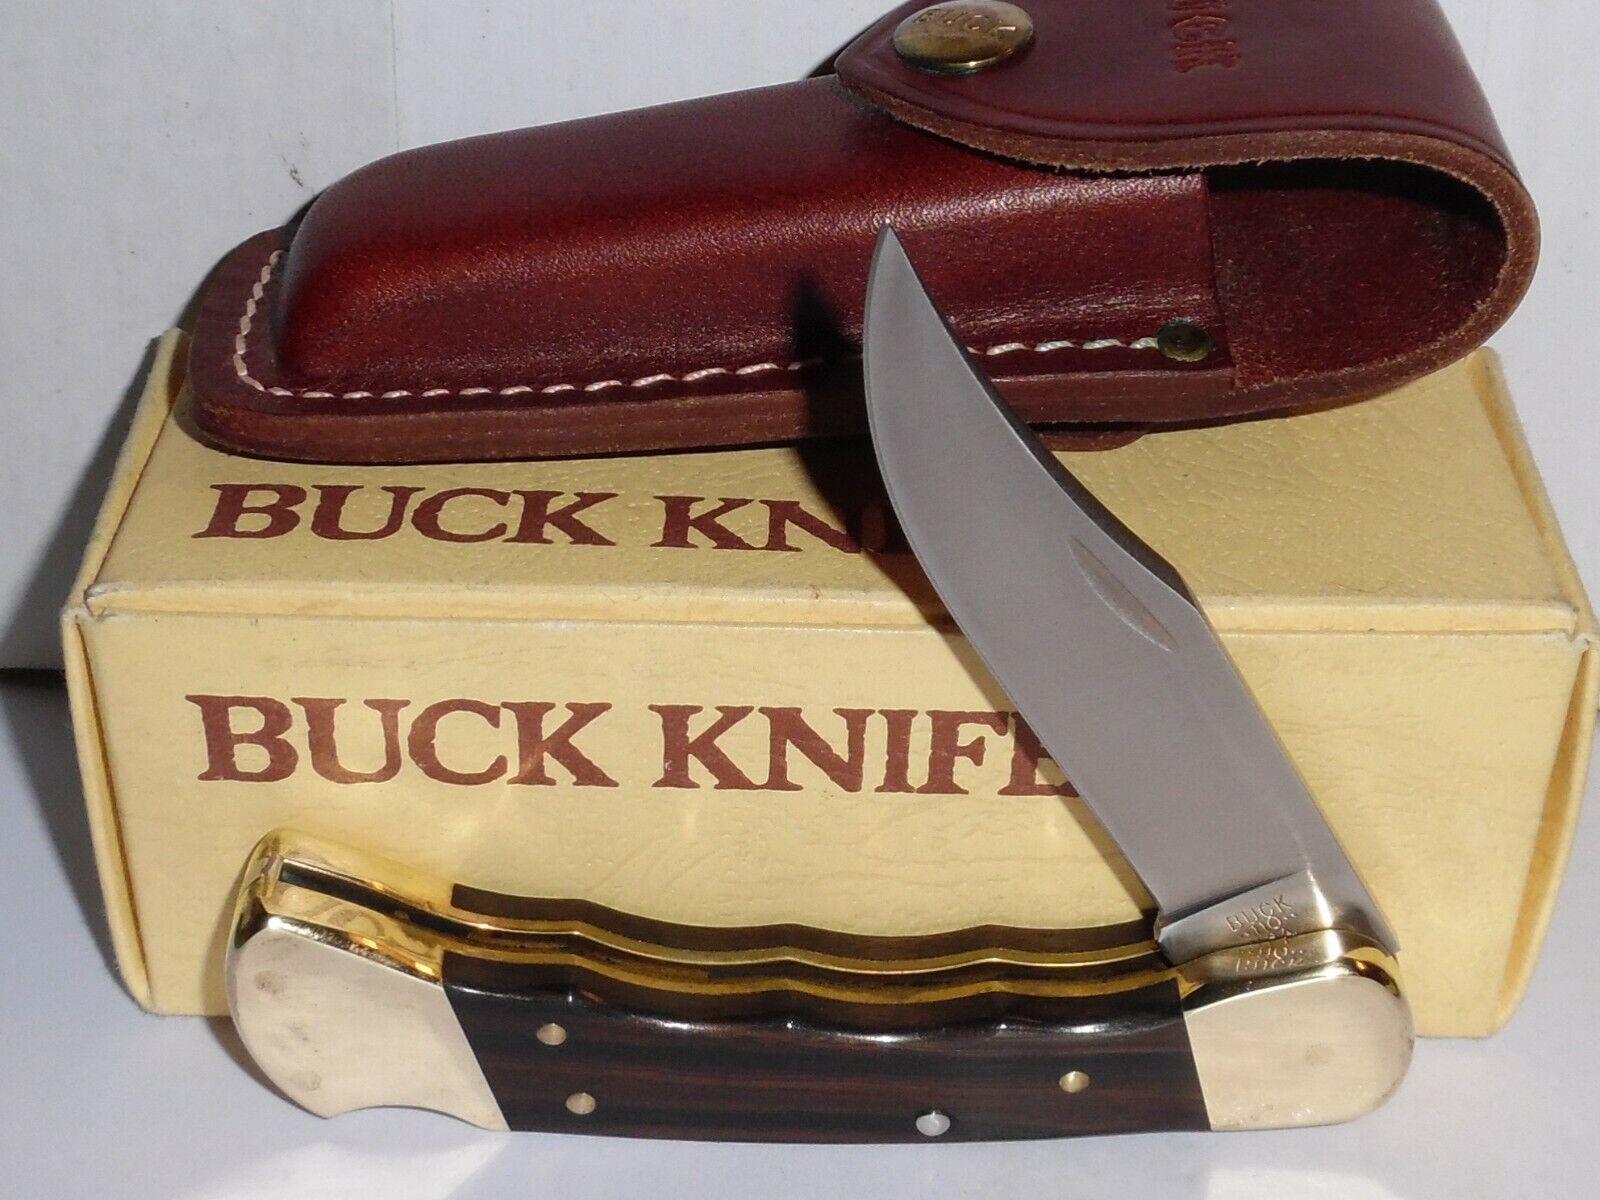 VINTAGE BUCK USA 110 FINGER GROOVED FOLDING HUNTER KNIFE w/BOX & SHEATH. 1980's